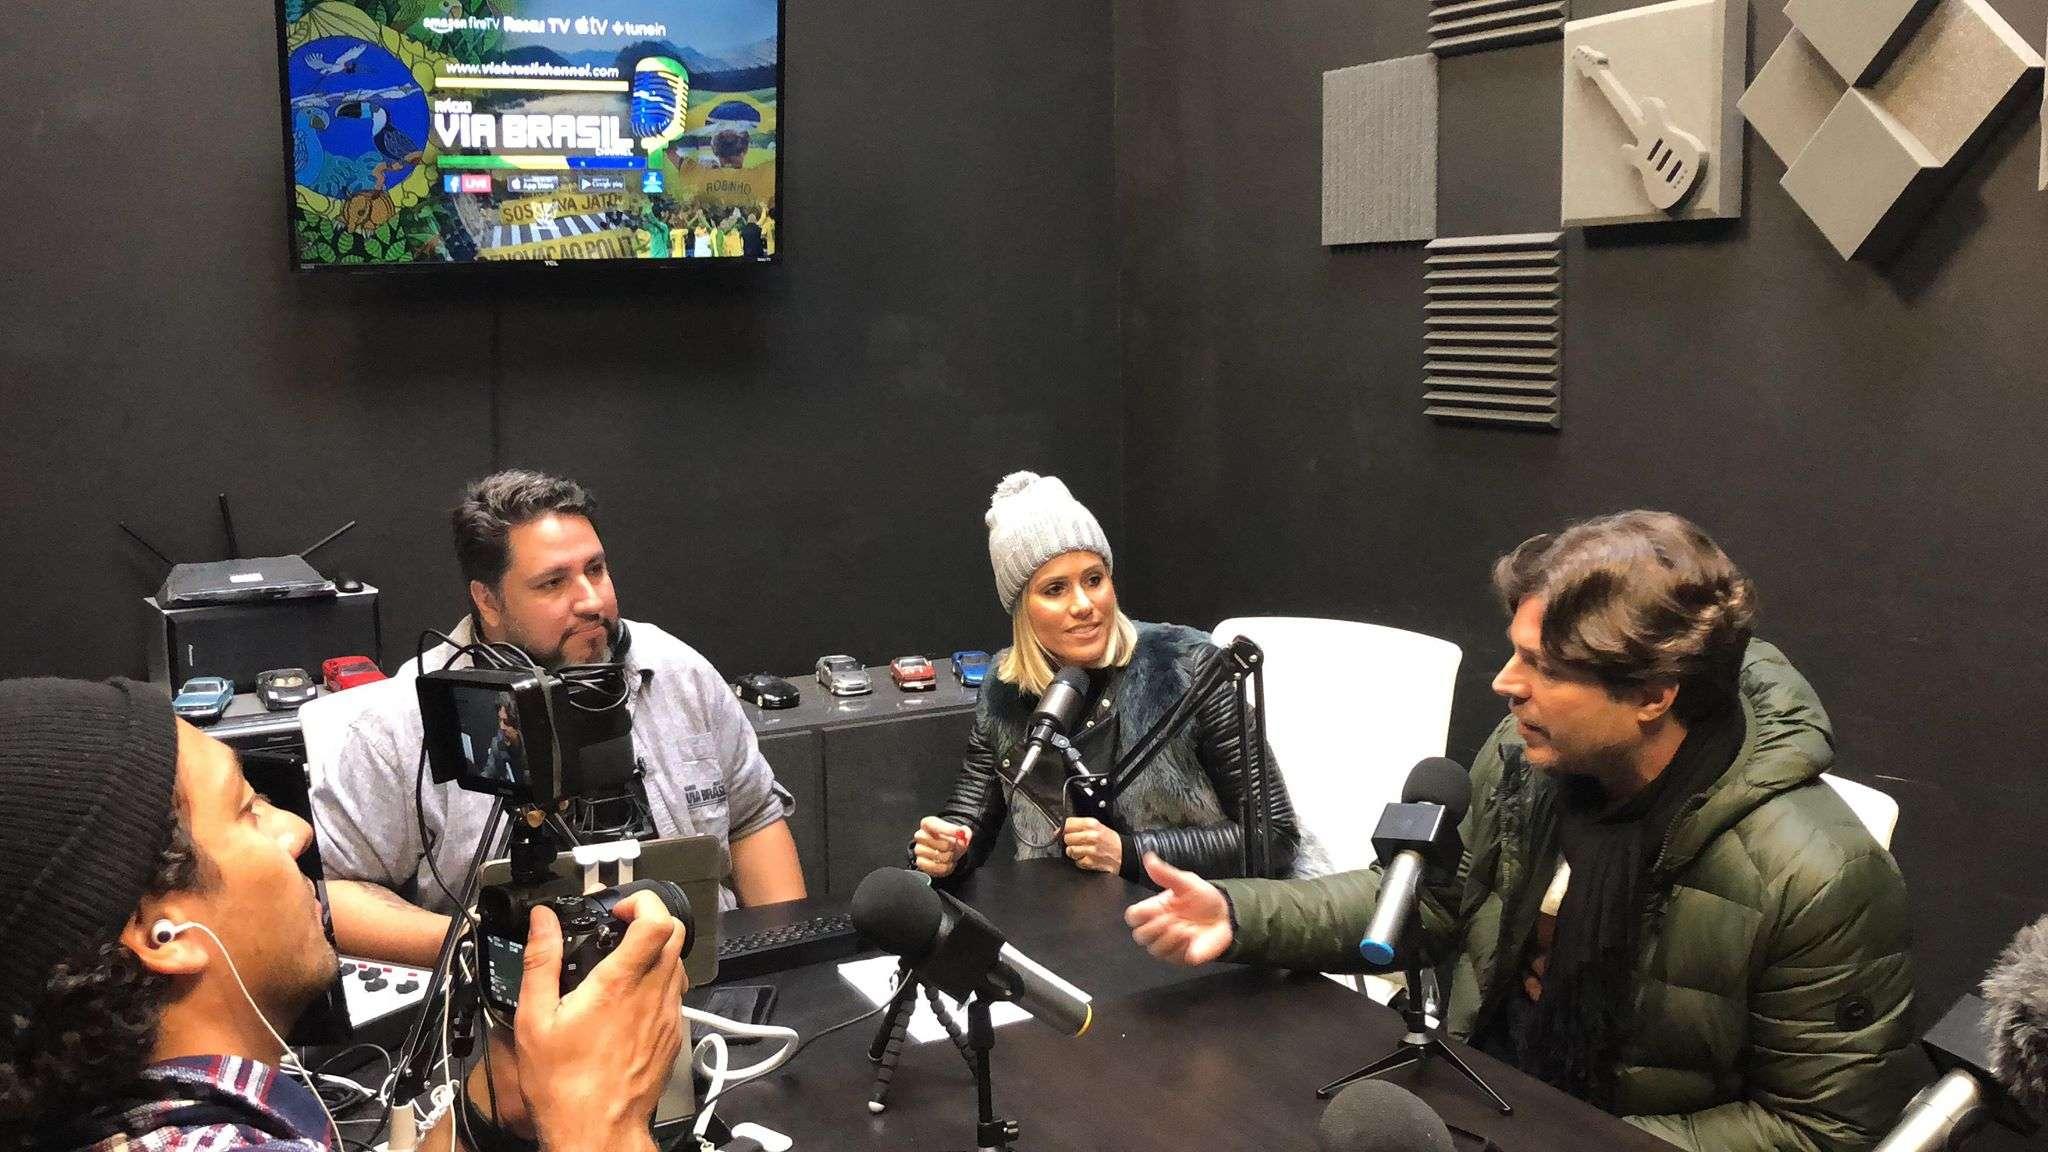 Chris Fox, o fundador da Radio Via Brasil Channel